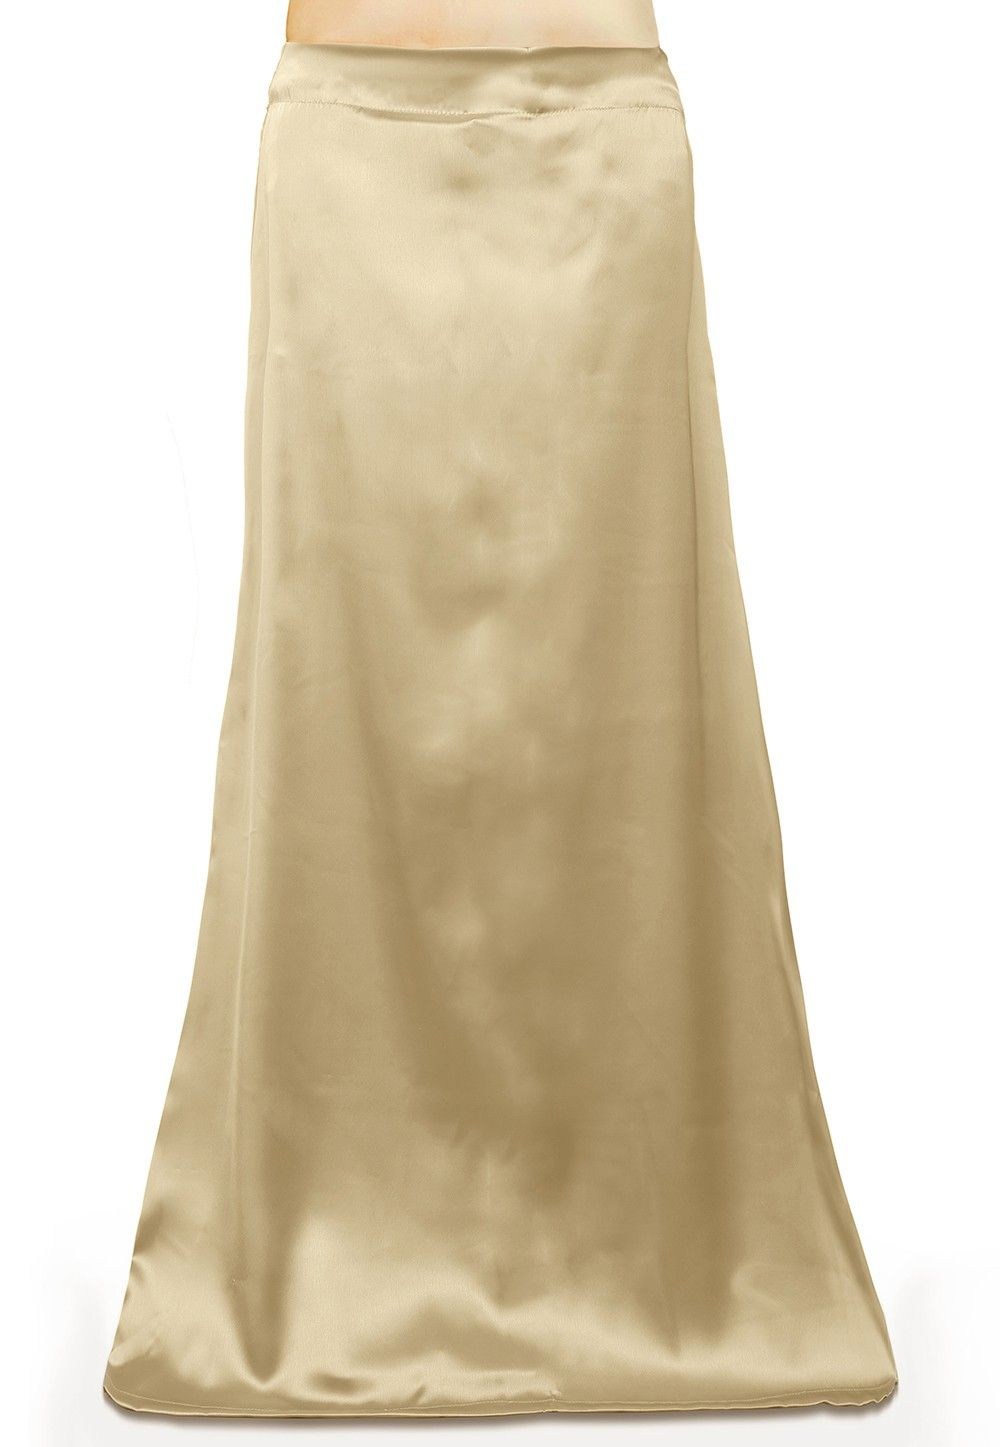 Satin Petticoat in Beige